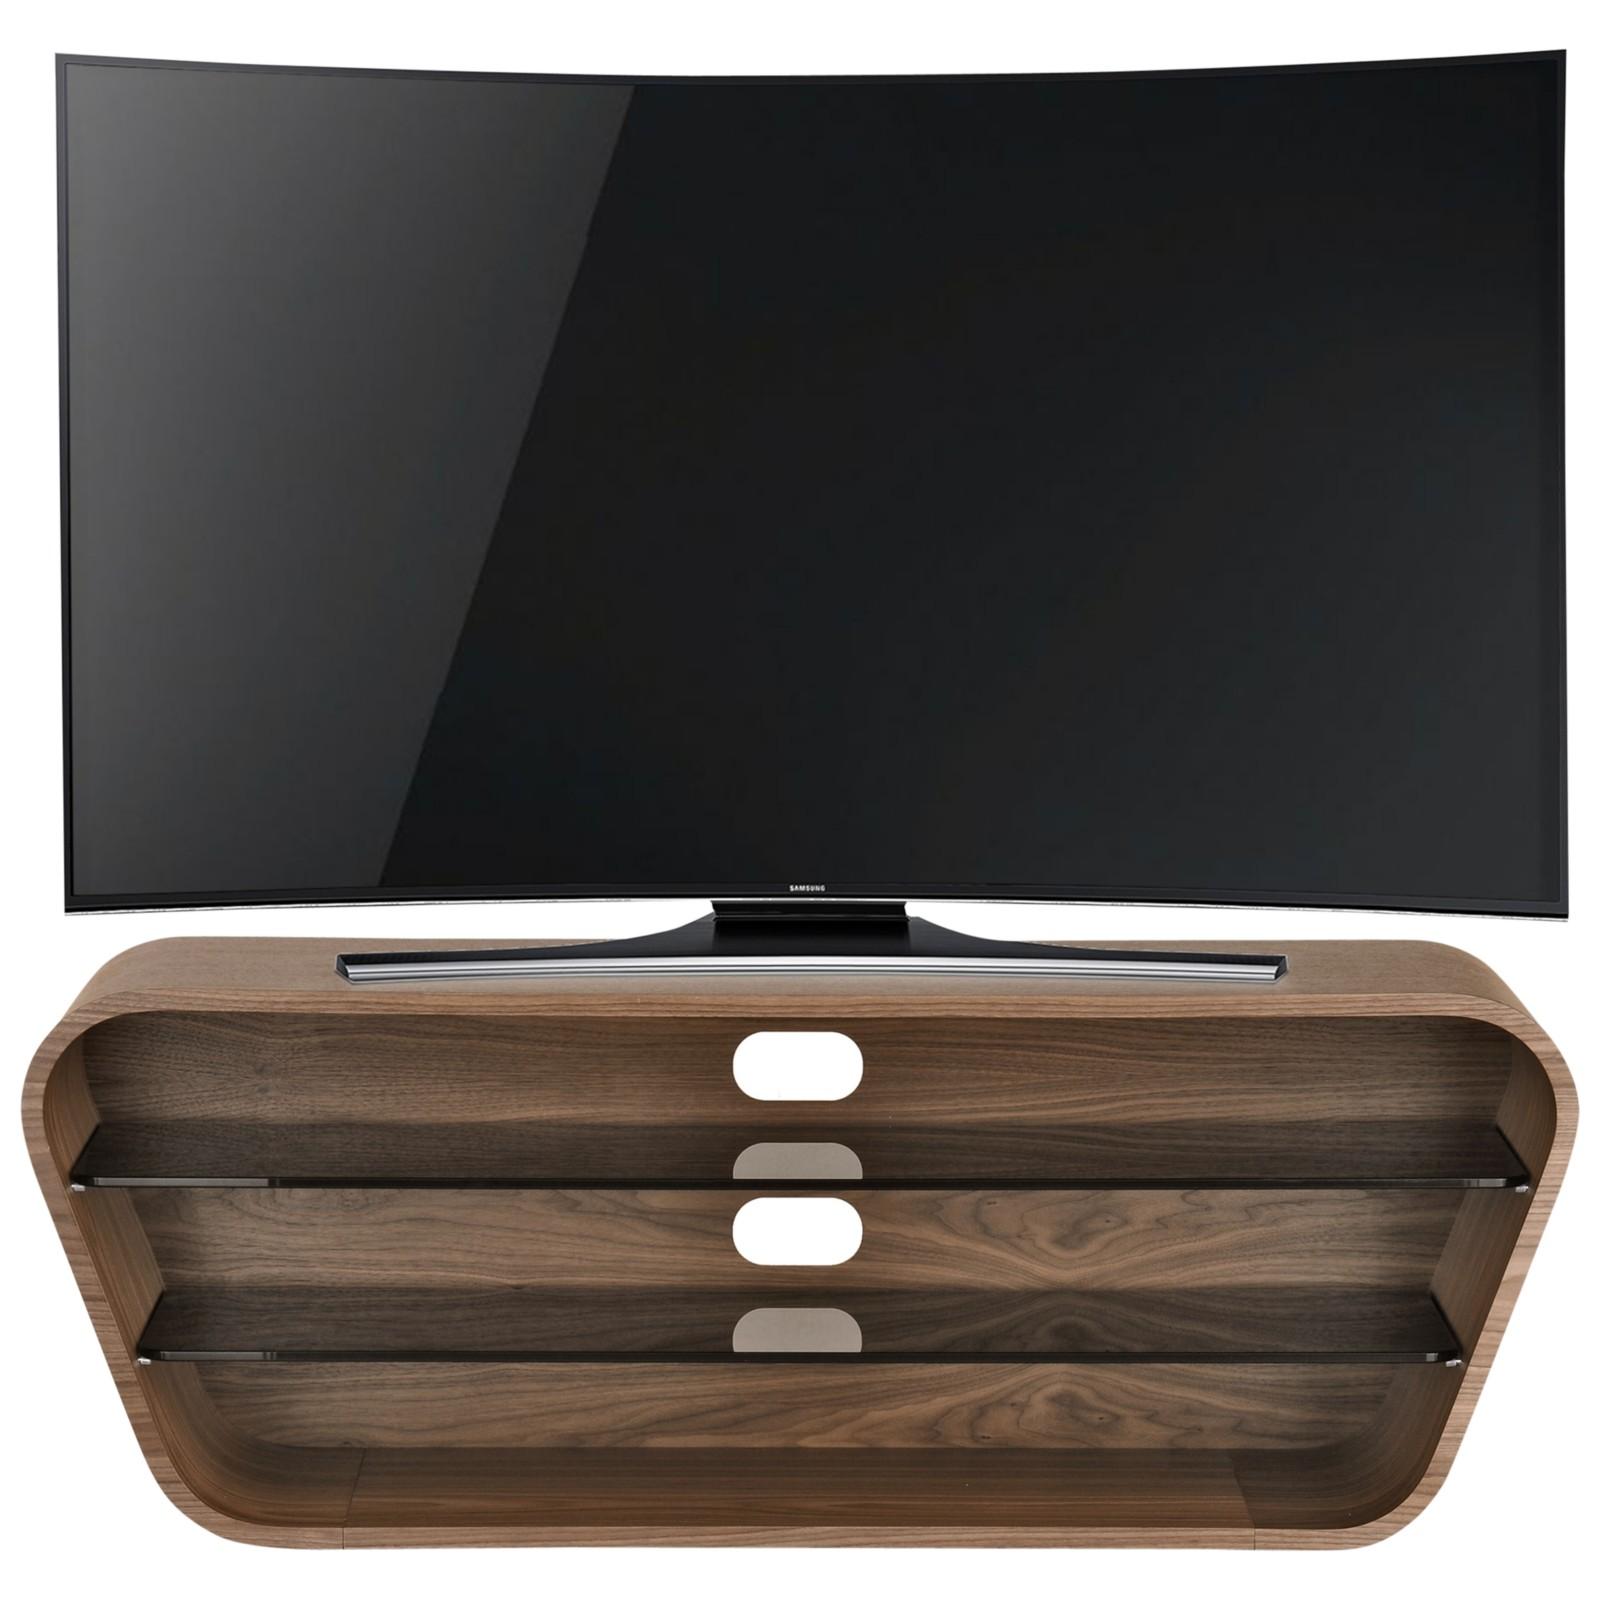 "Tom Schneider Swish 1200 TV Stand For TVs Up To 50"" Natural walnut"